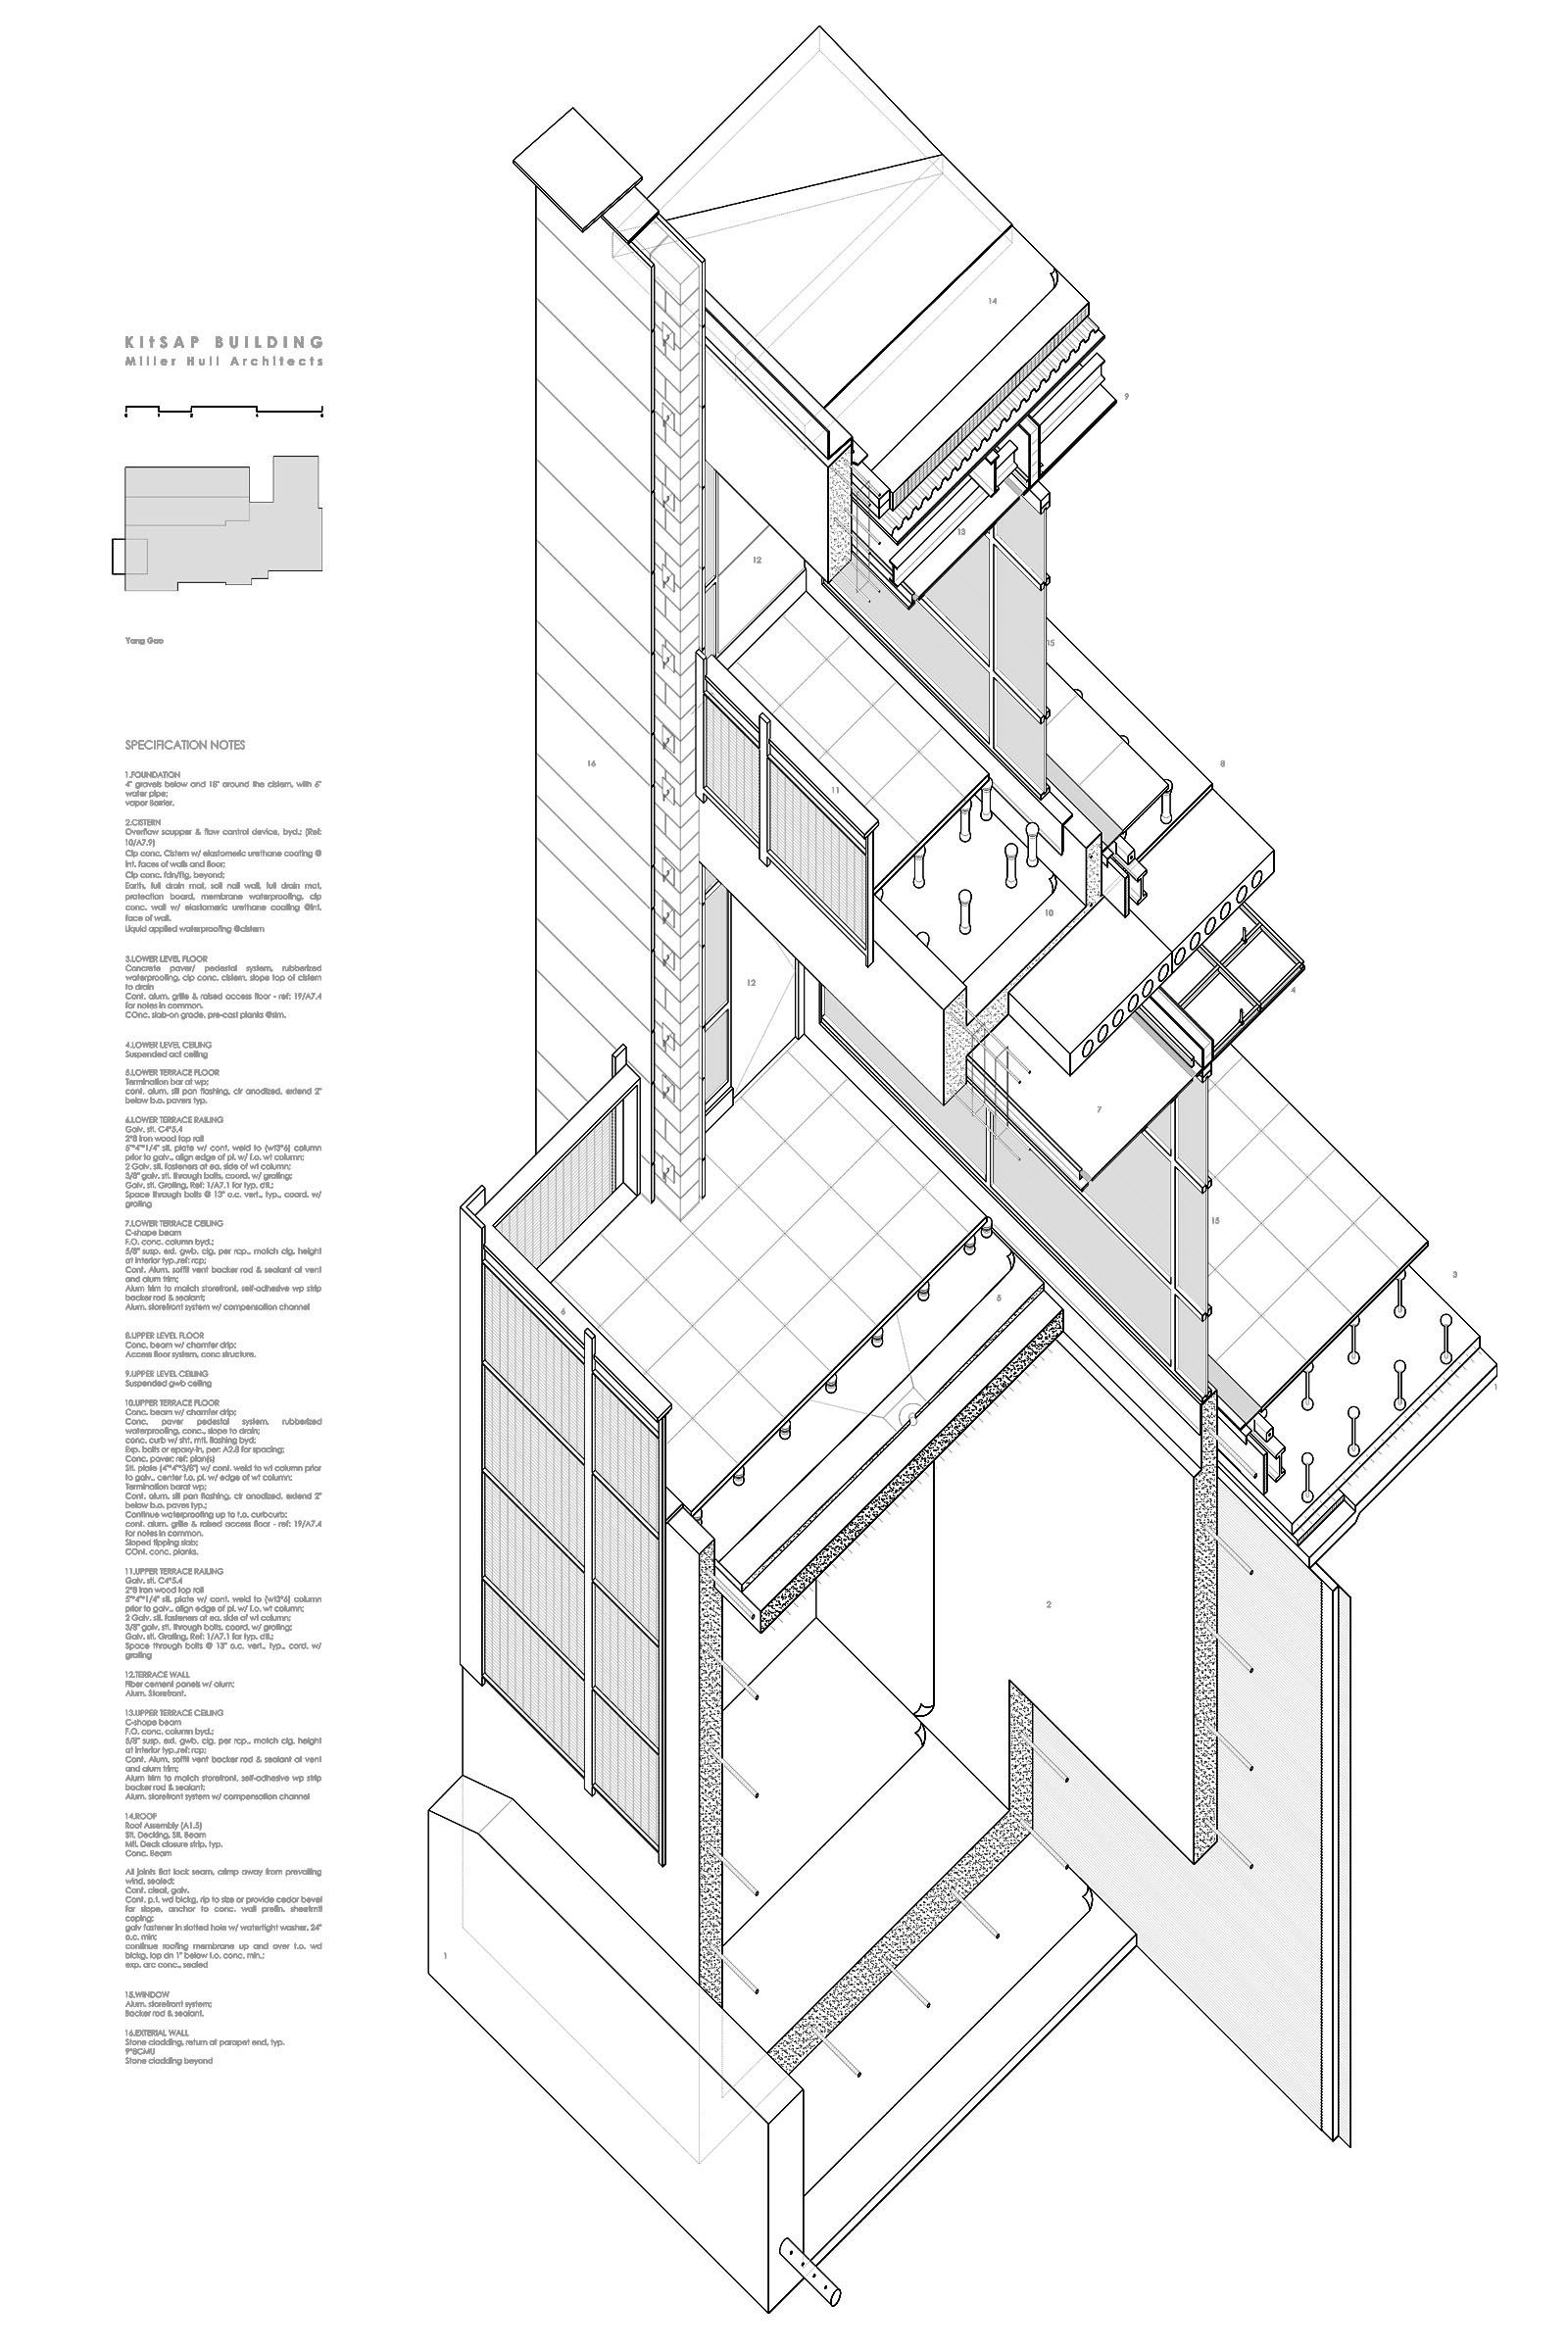 Axonometric Drawing Kitsap Building Designed By A